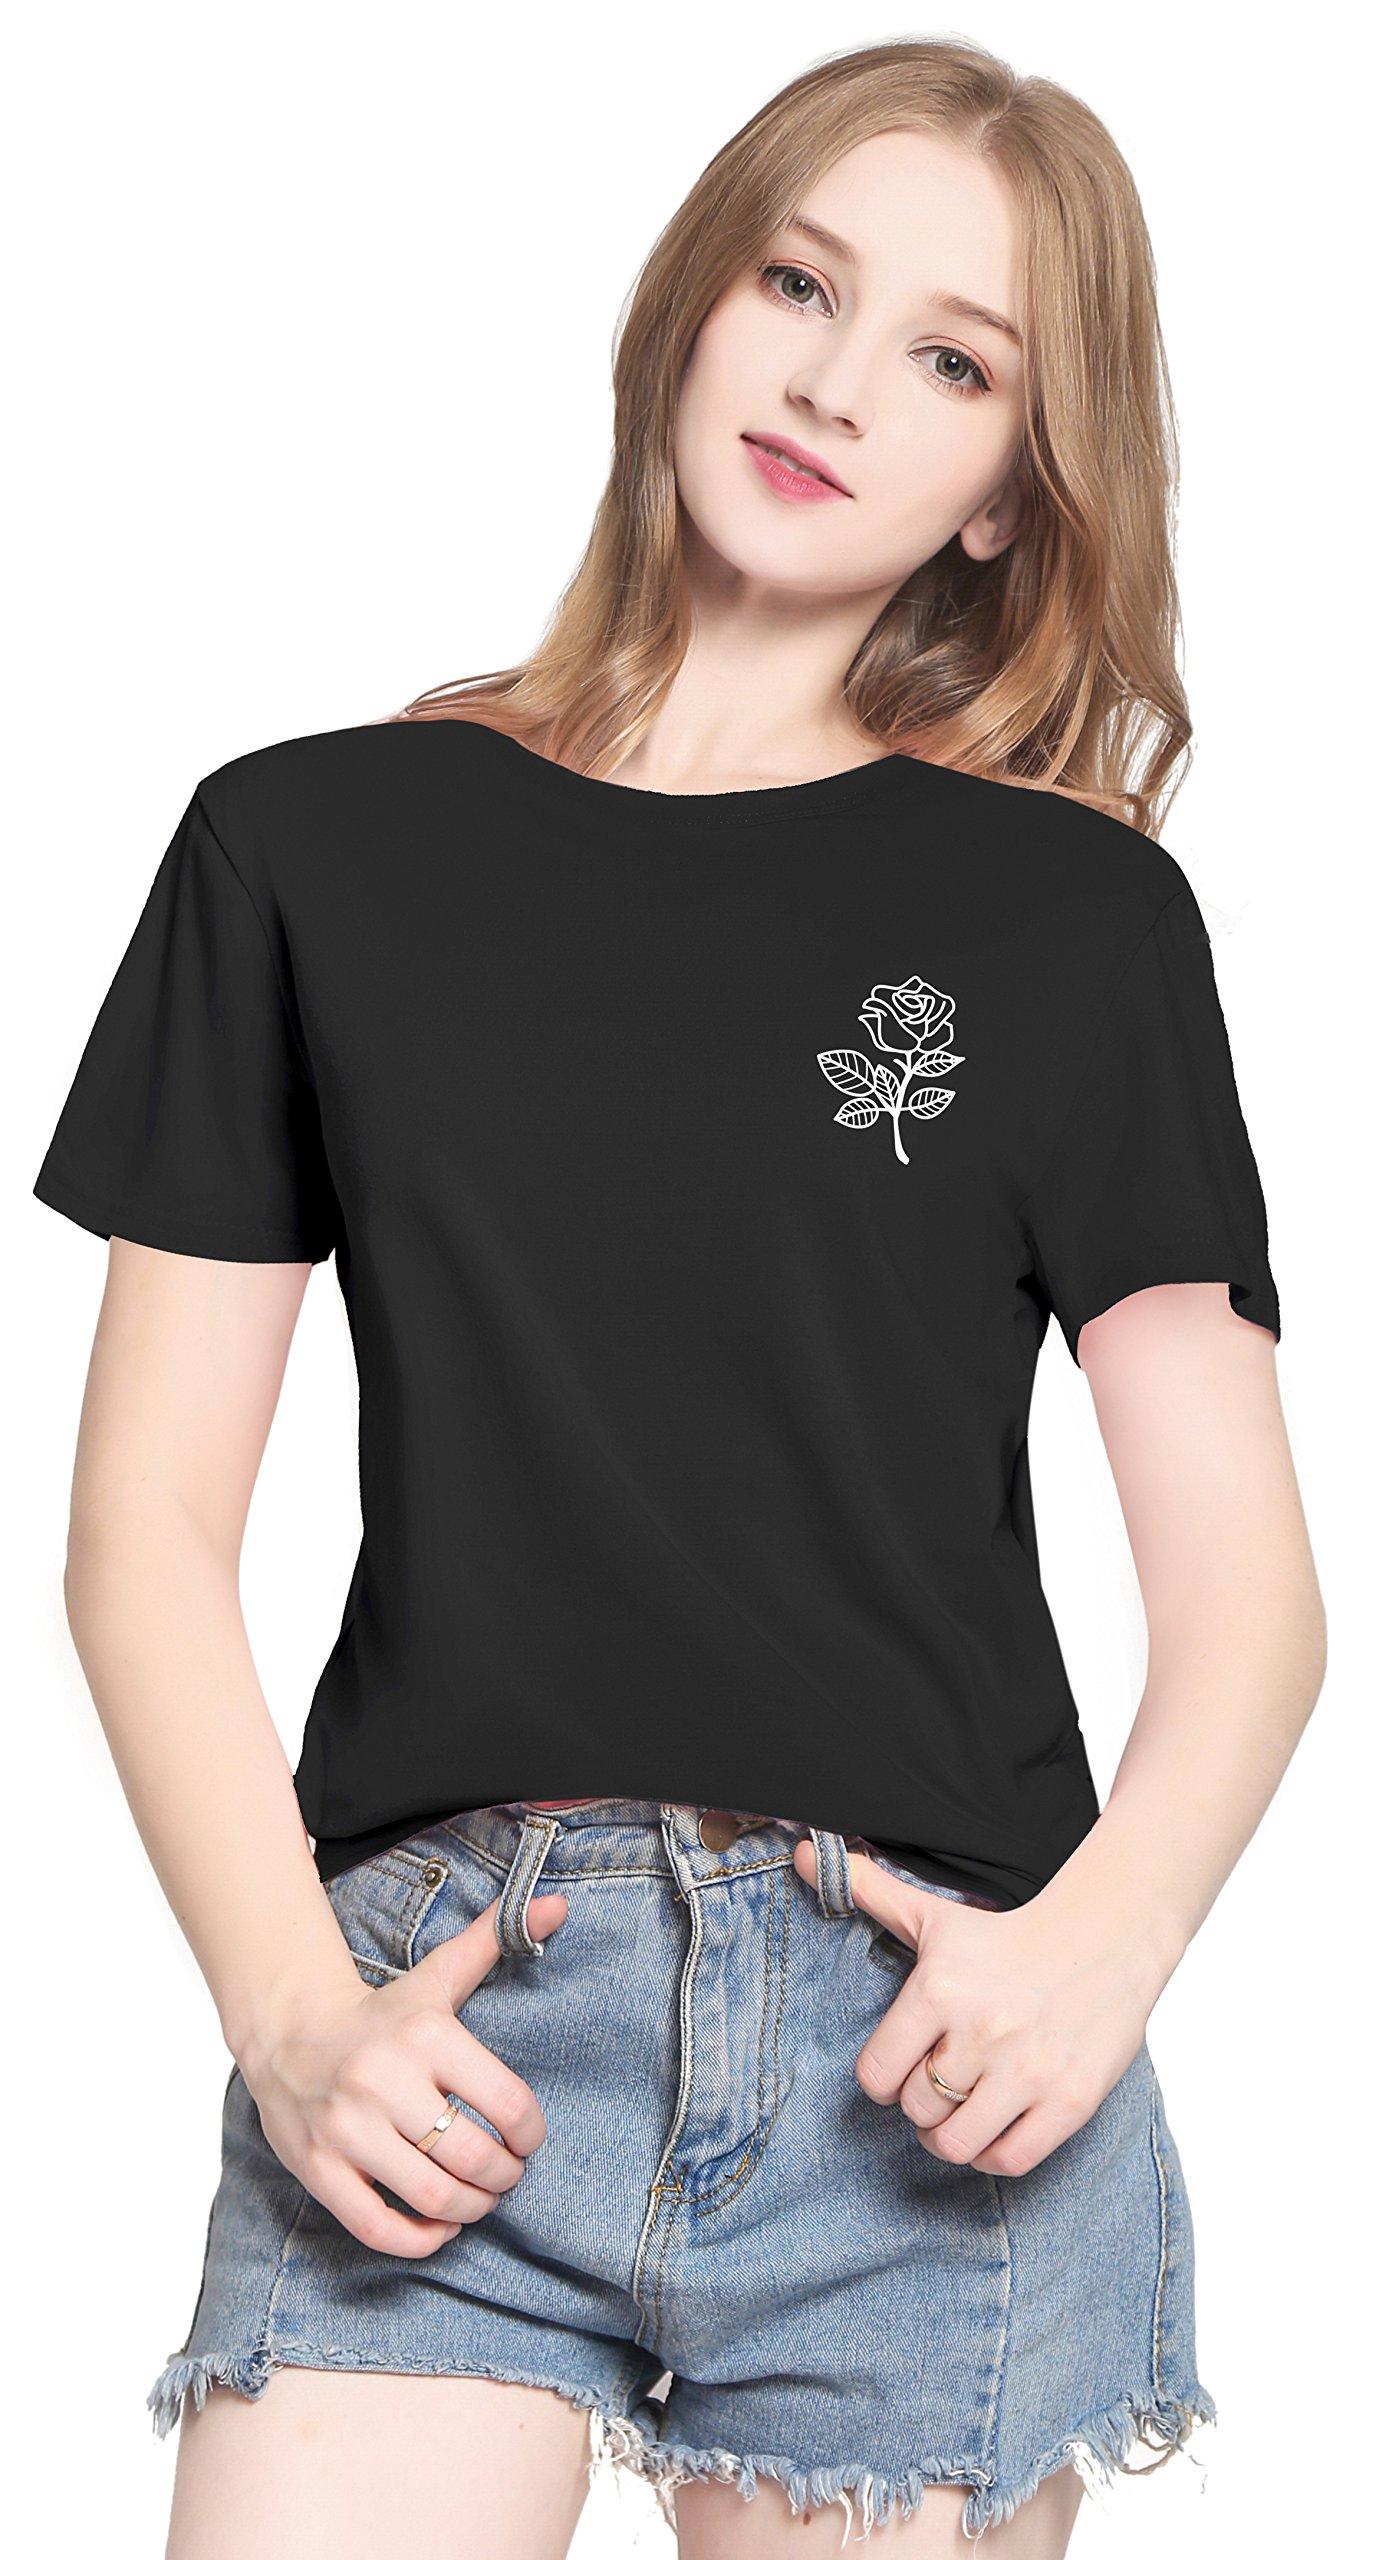 PINJIA Womens Cute Letter Printed Graphic Funny Tshirts Top Tees(MX15)(XXL.Black Rose)